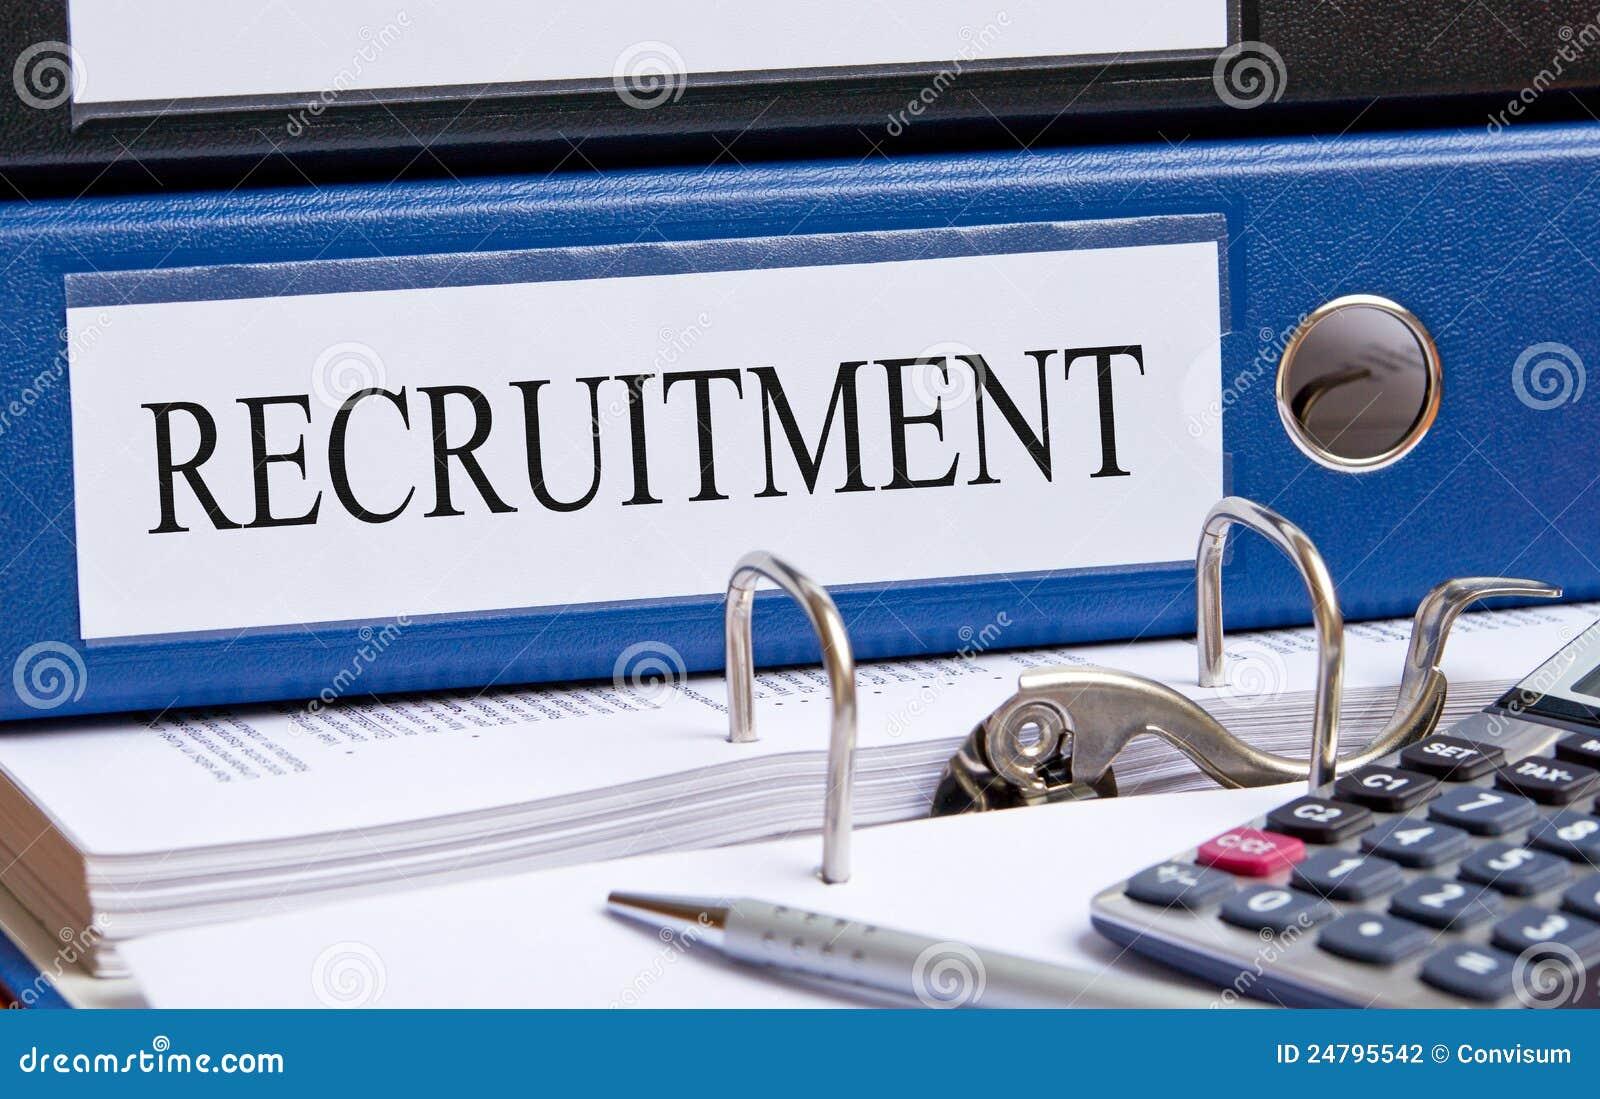 Recruitment binder in office